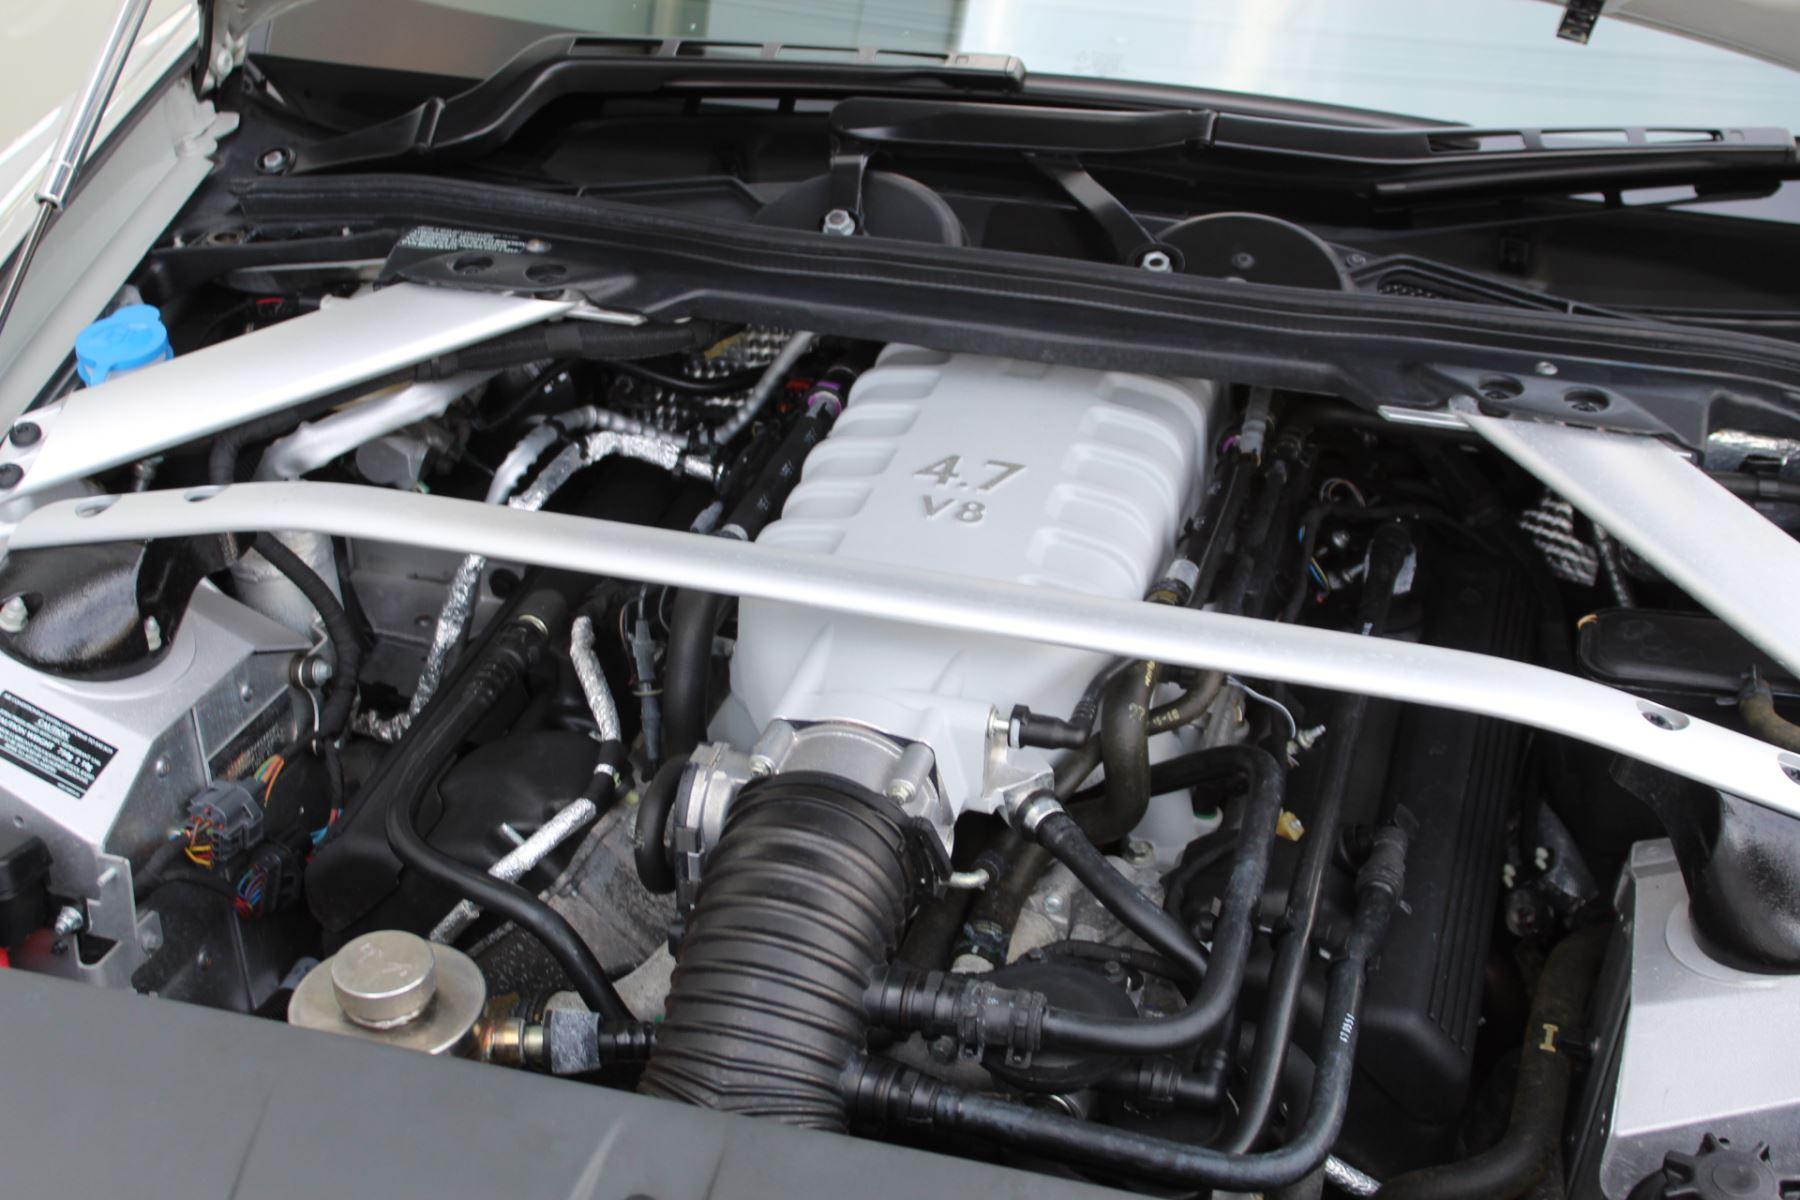 Aston Martin V8 Vantage Coupe 2dr [420] Latest Dash, 420BHP image 21